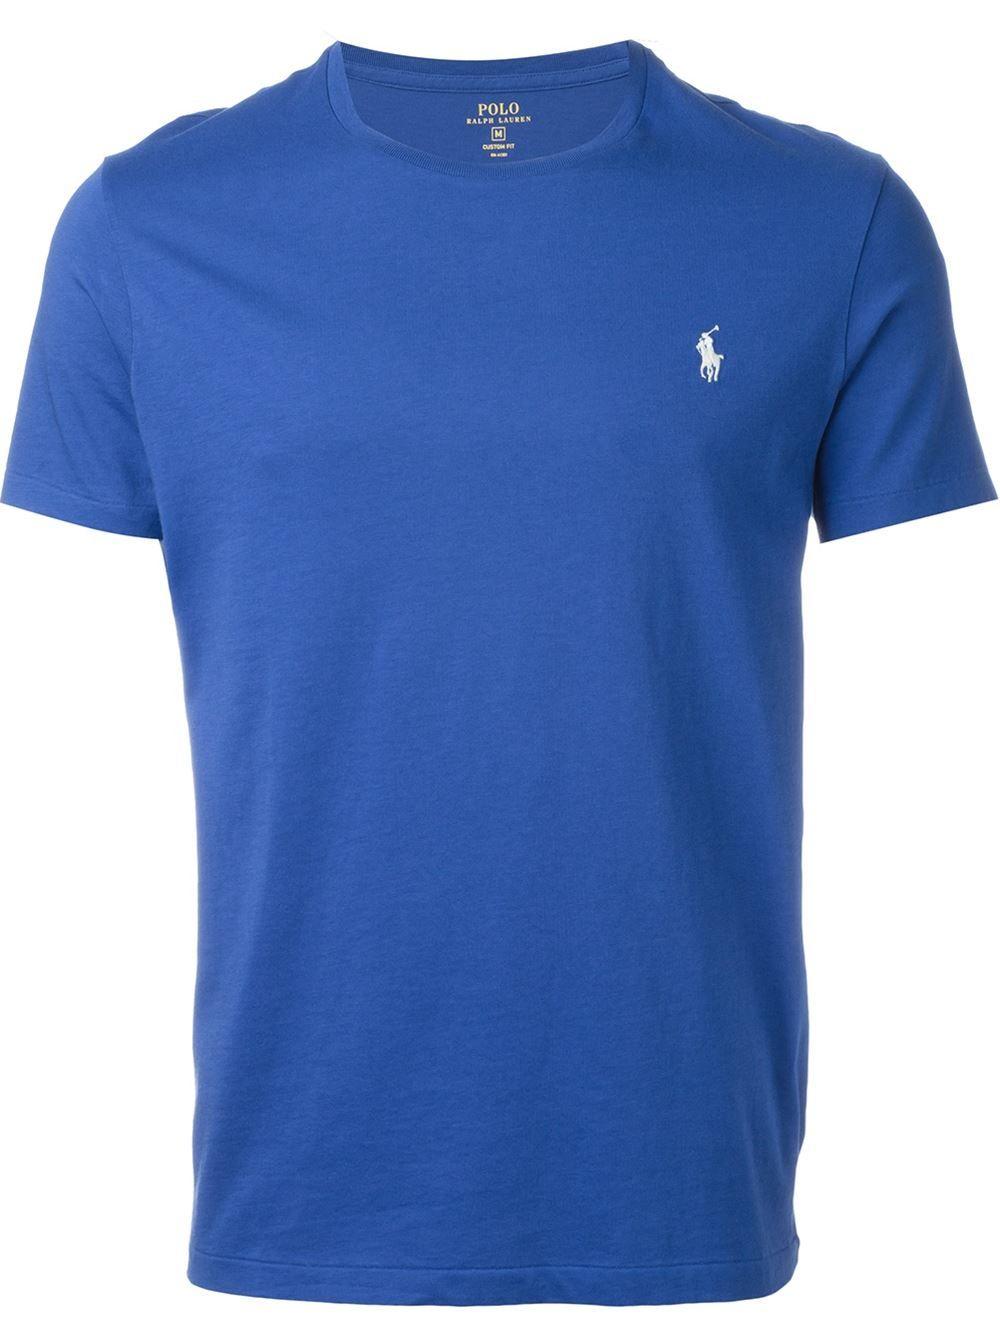 Polo Ralph Lauren t-shirt à logo   T-shirts Hommes   Pinterest ... 8d8e54c4cce